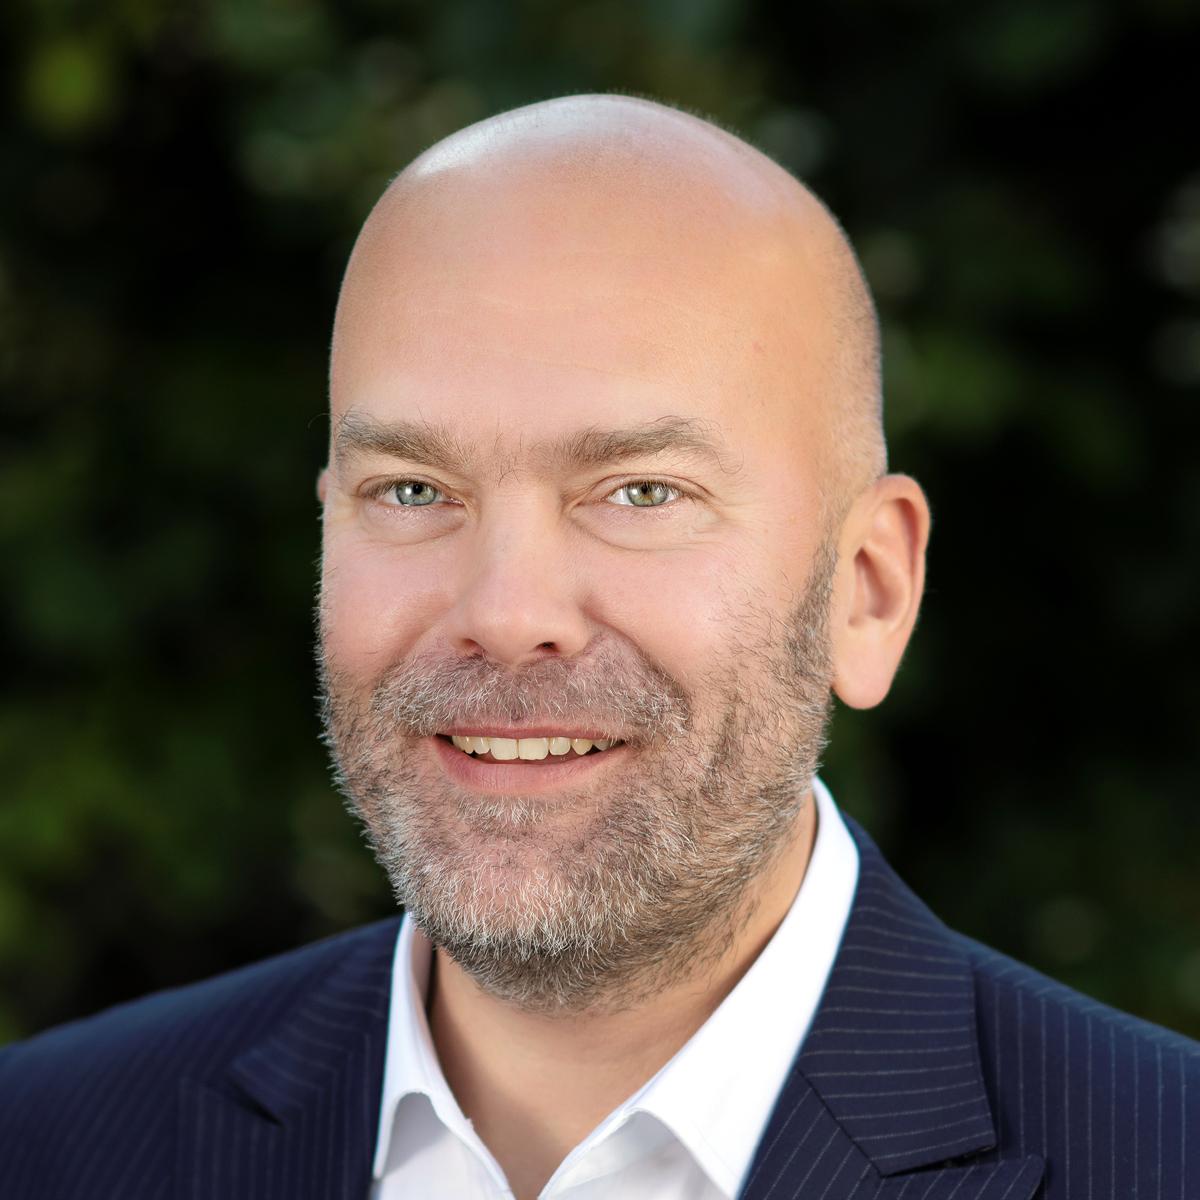 Konsernledelse, CEO, Richard Ternblom